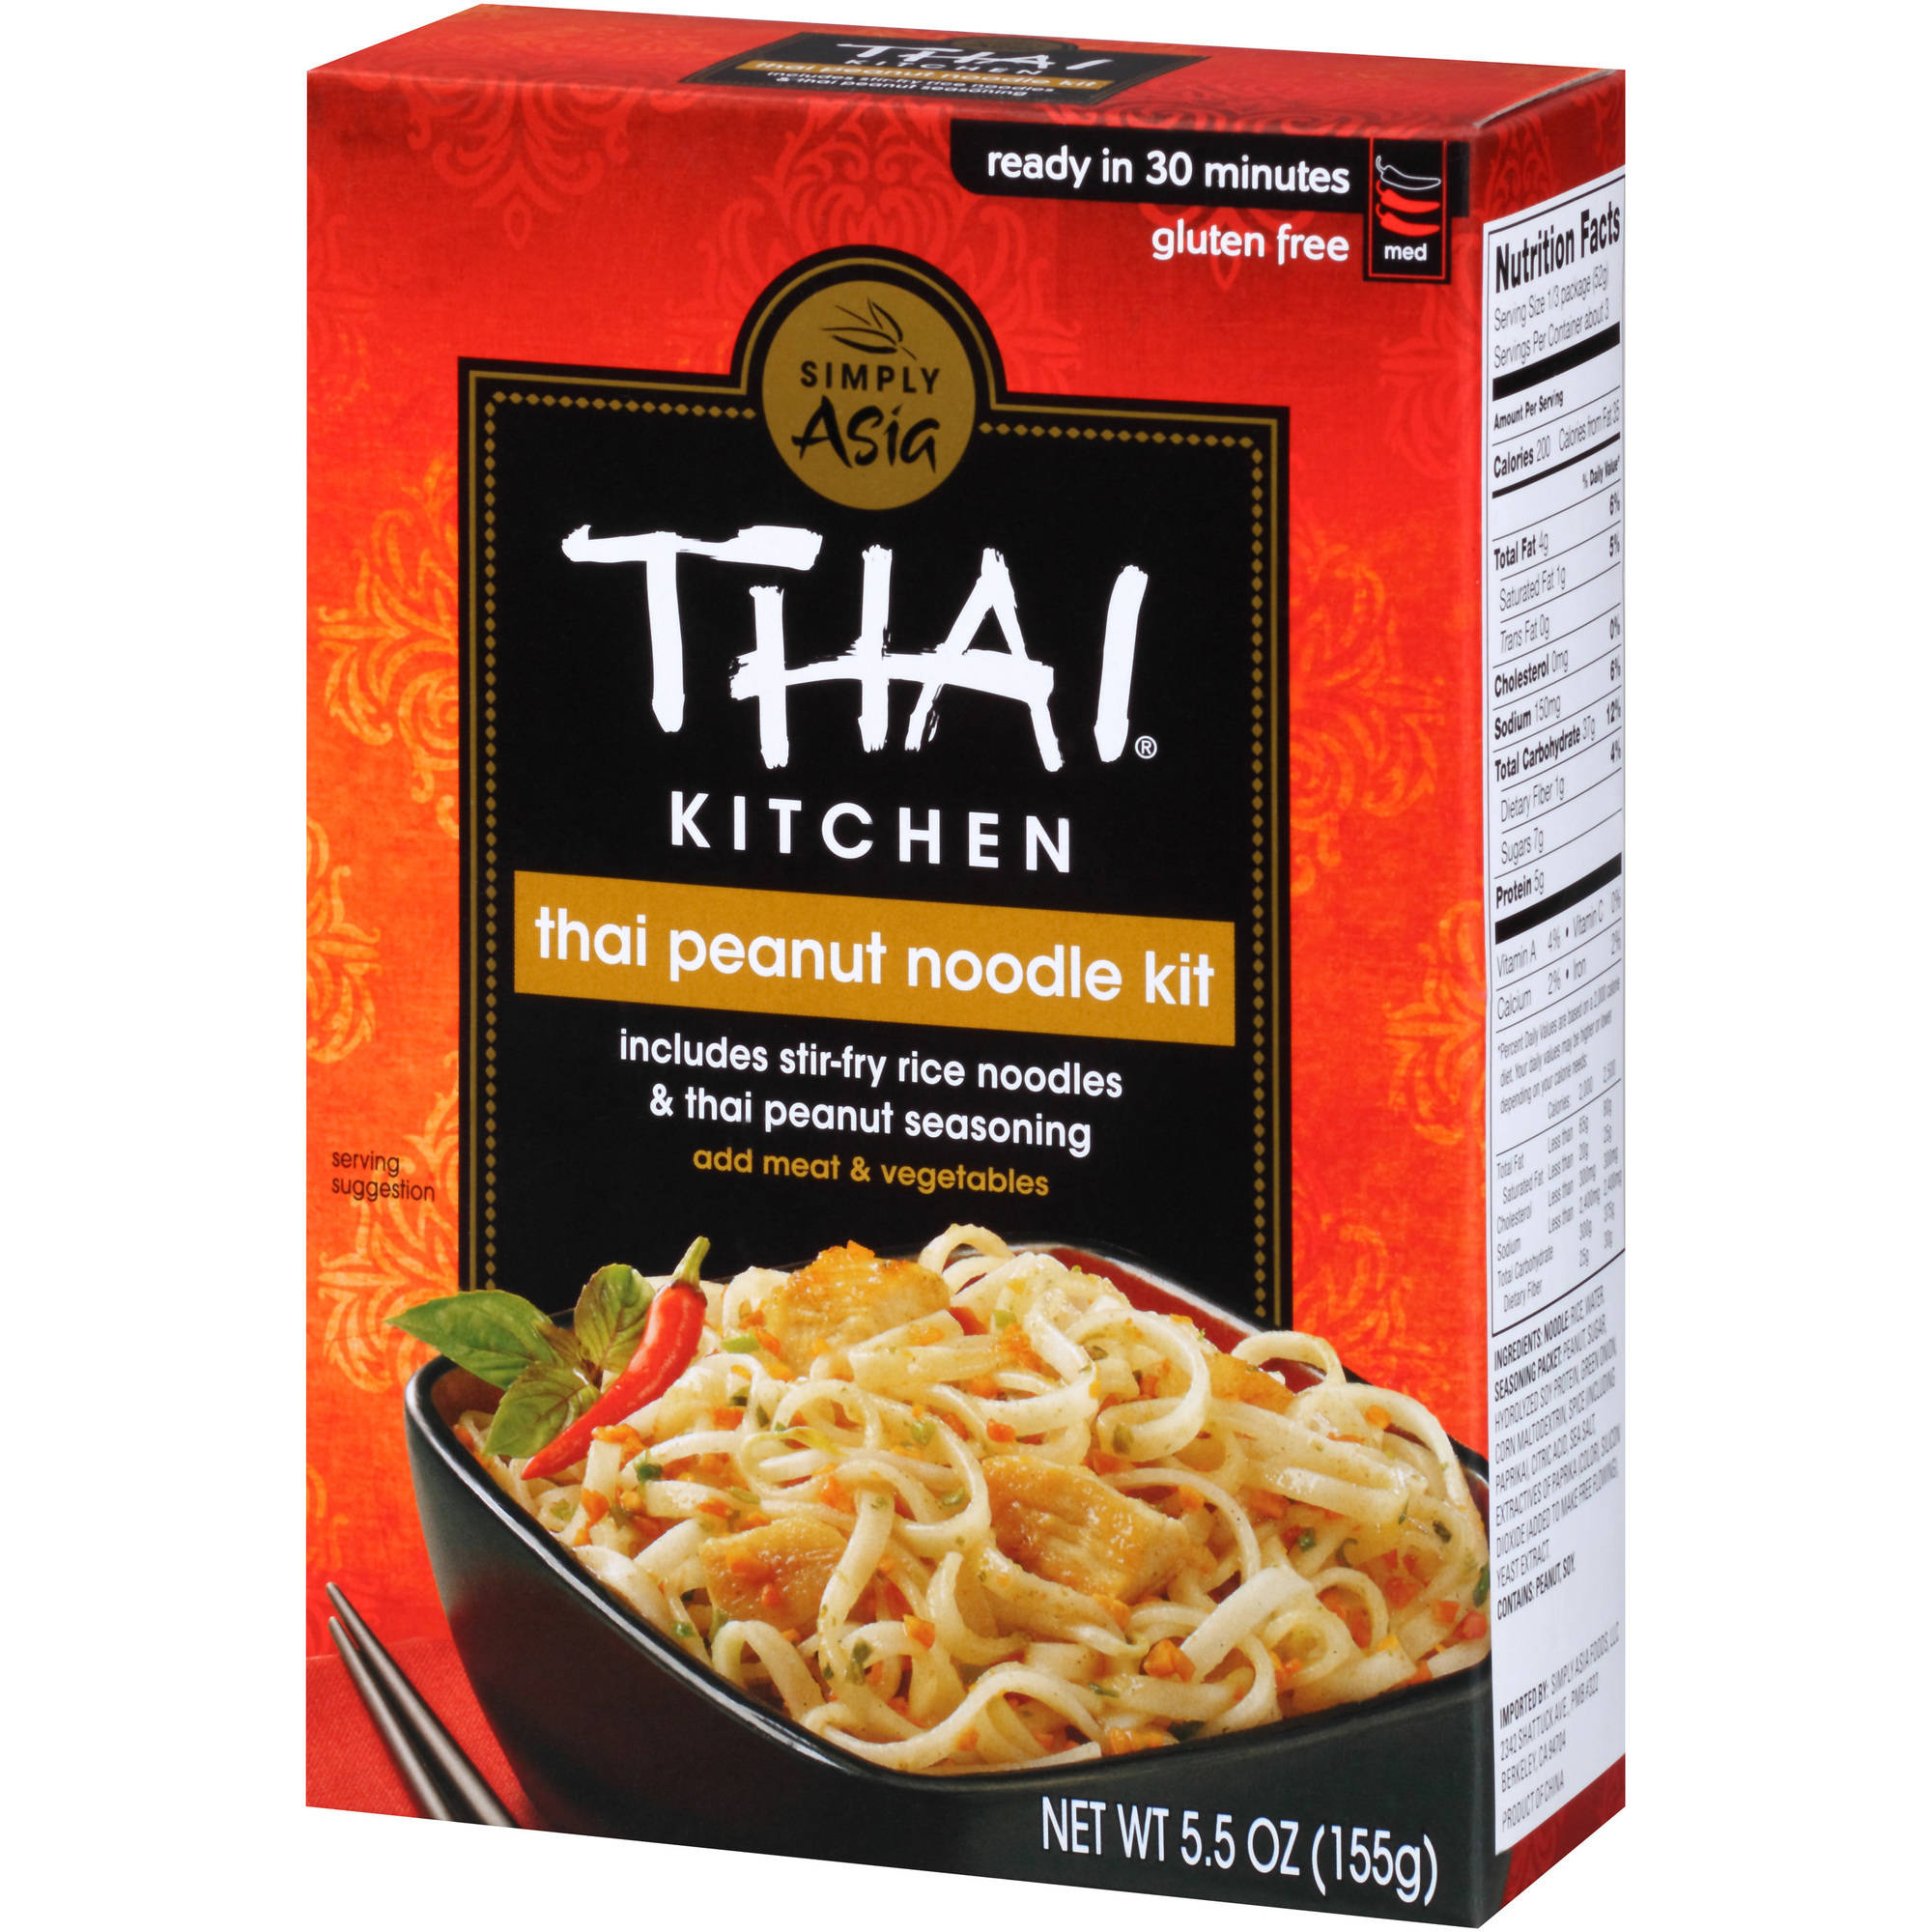 Thai Kitchen Noodles Thai Kitchen Gluten Free Thai Peanut Stir Fry Noodles 5.5 Oz